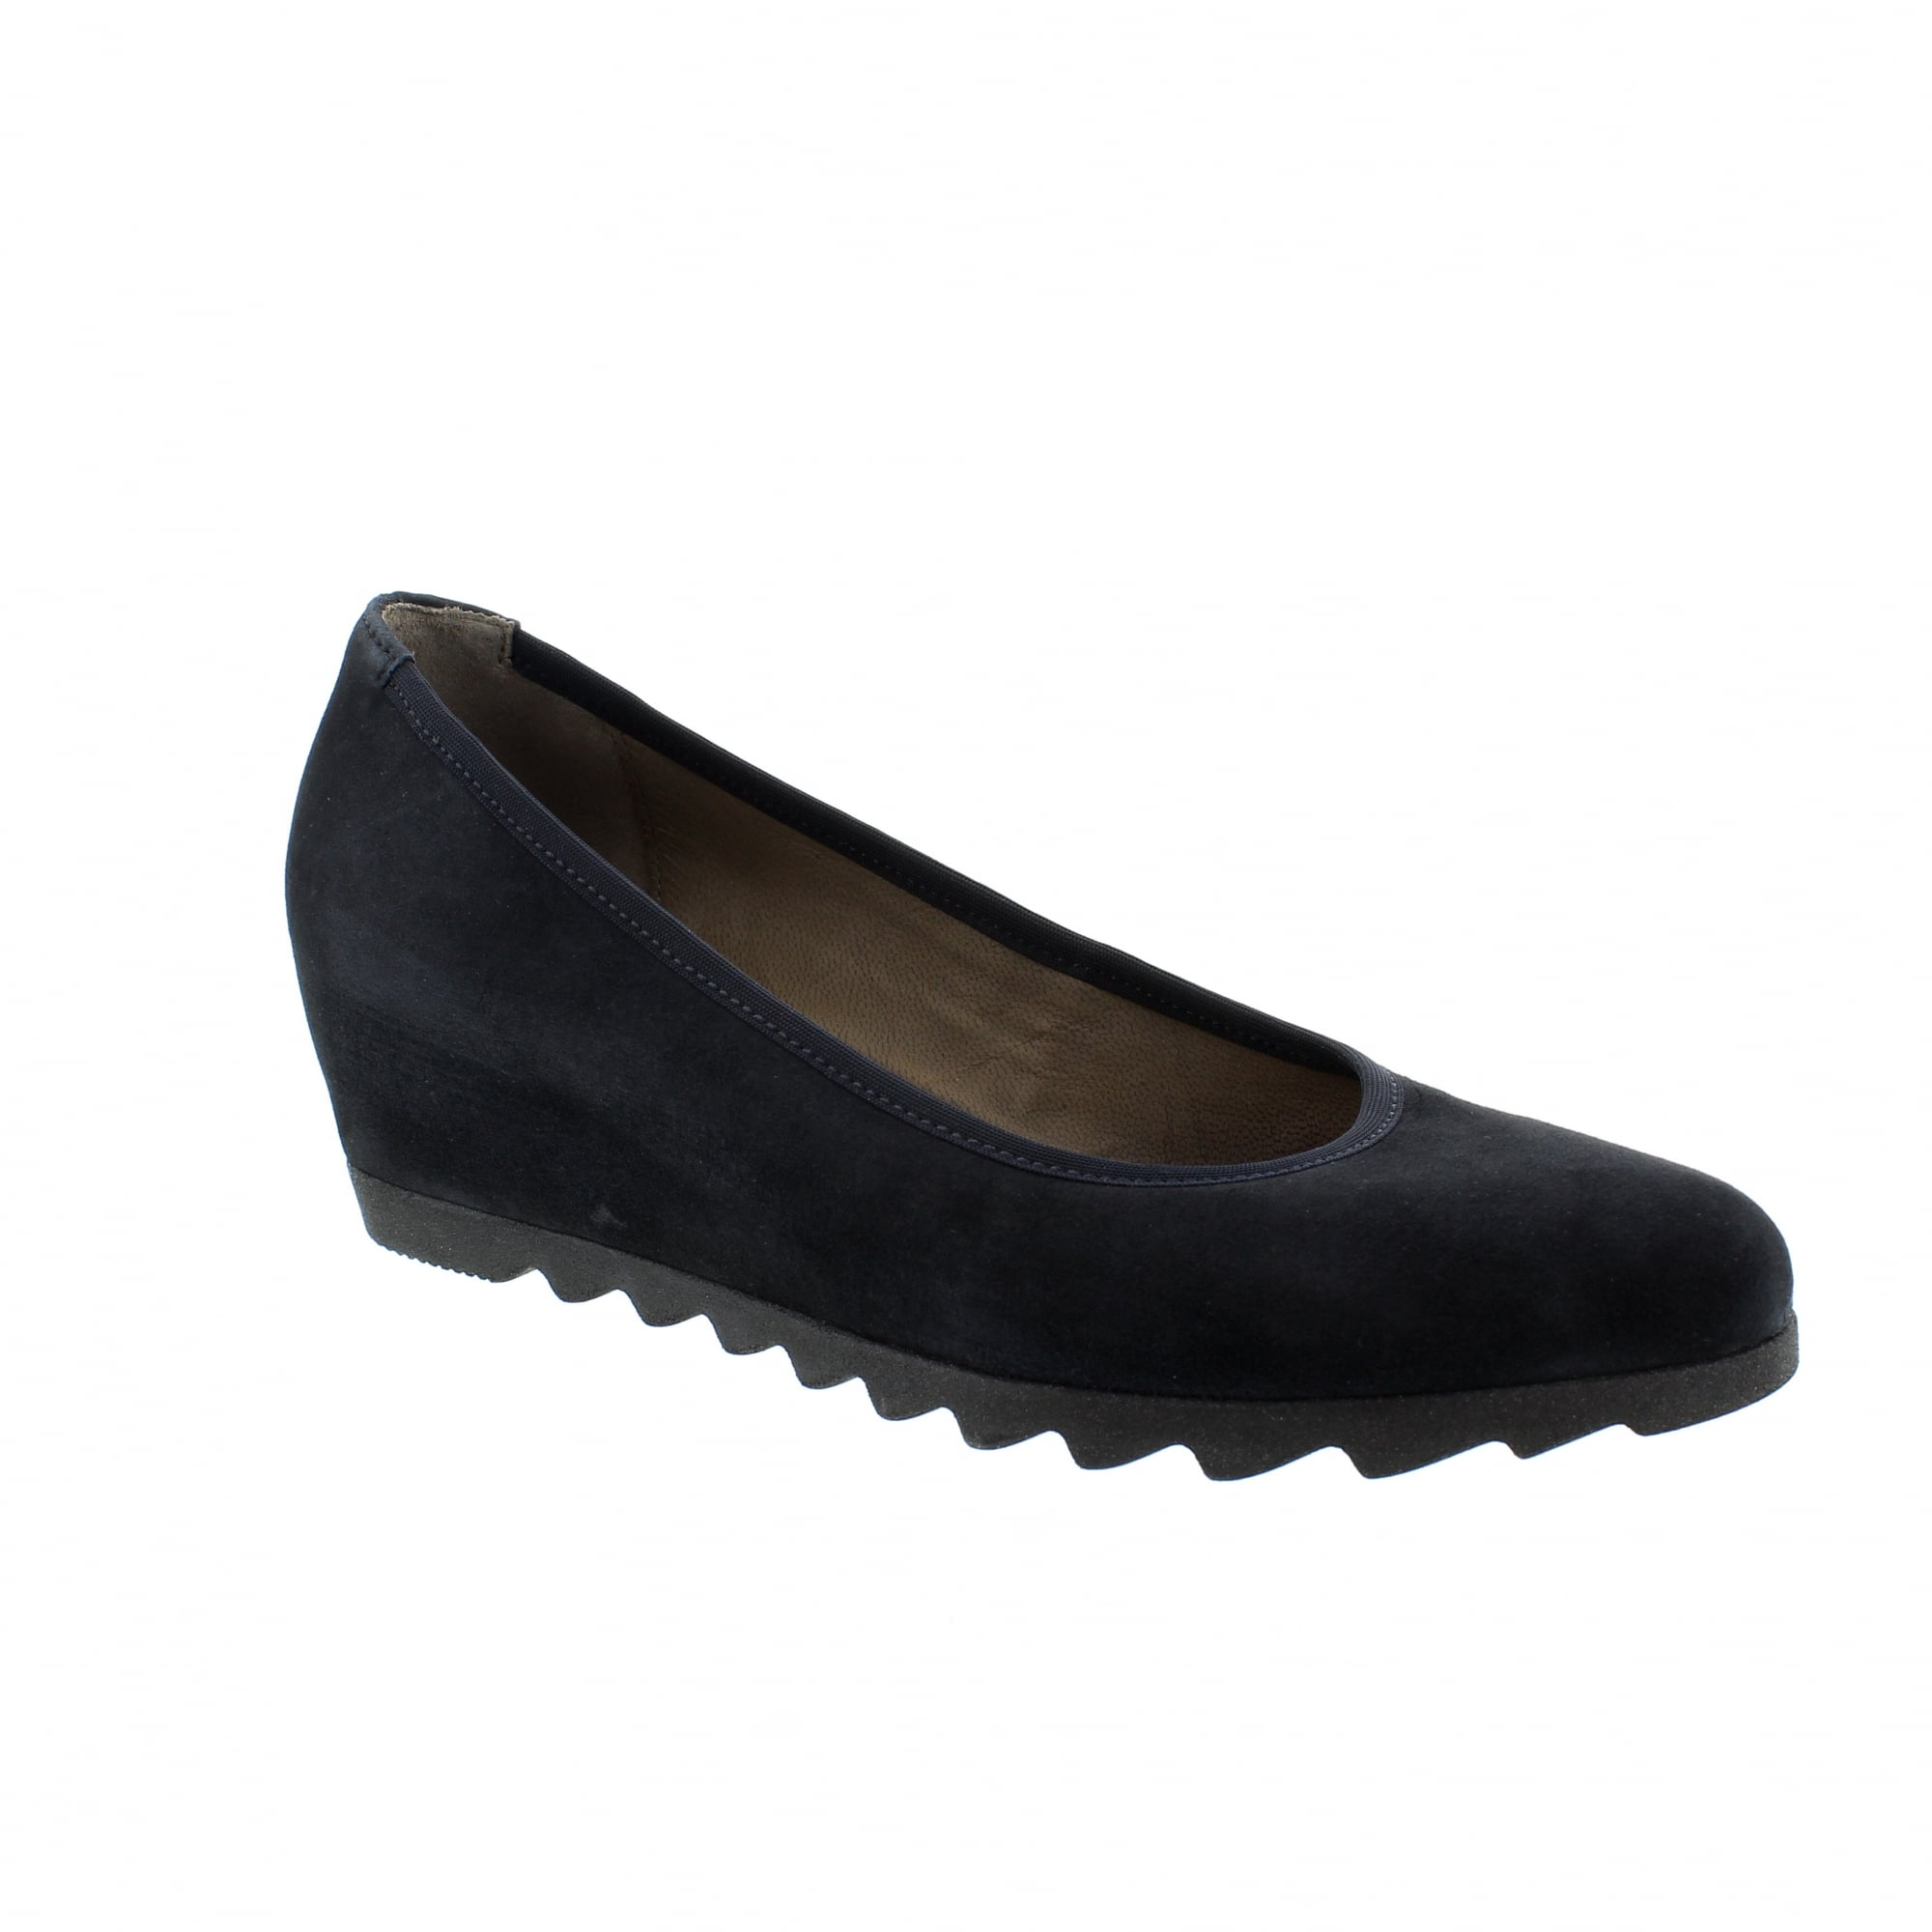 4e3c0cb580 Gabor Request 25-320-16 Navy Suede Womens Wedge Pumps | Rogerson Shoes